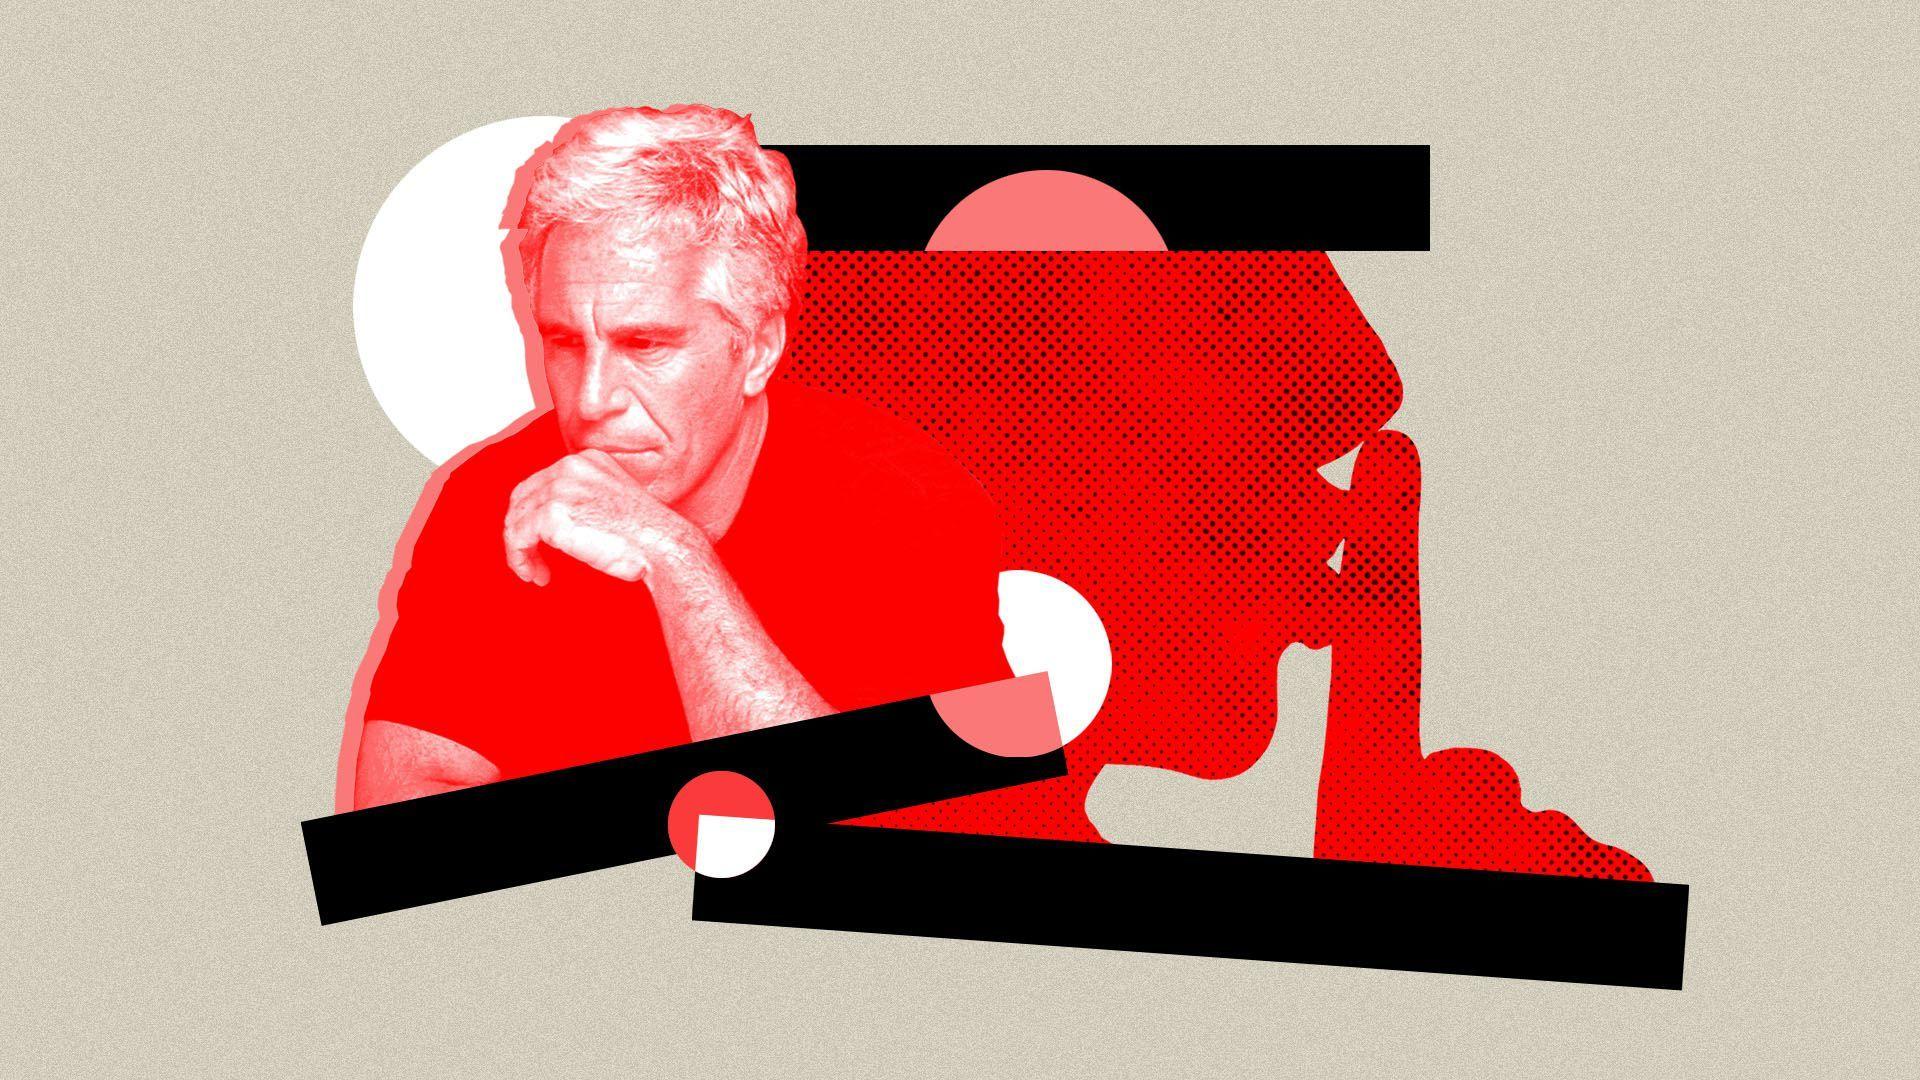 Jeffrey Epstein photo illustration